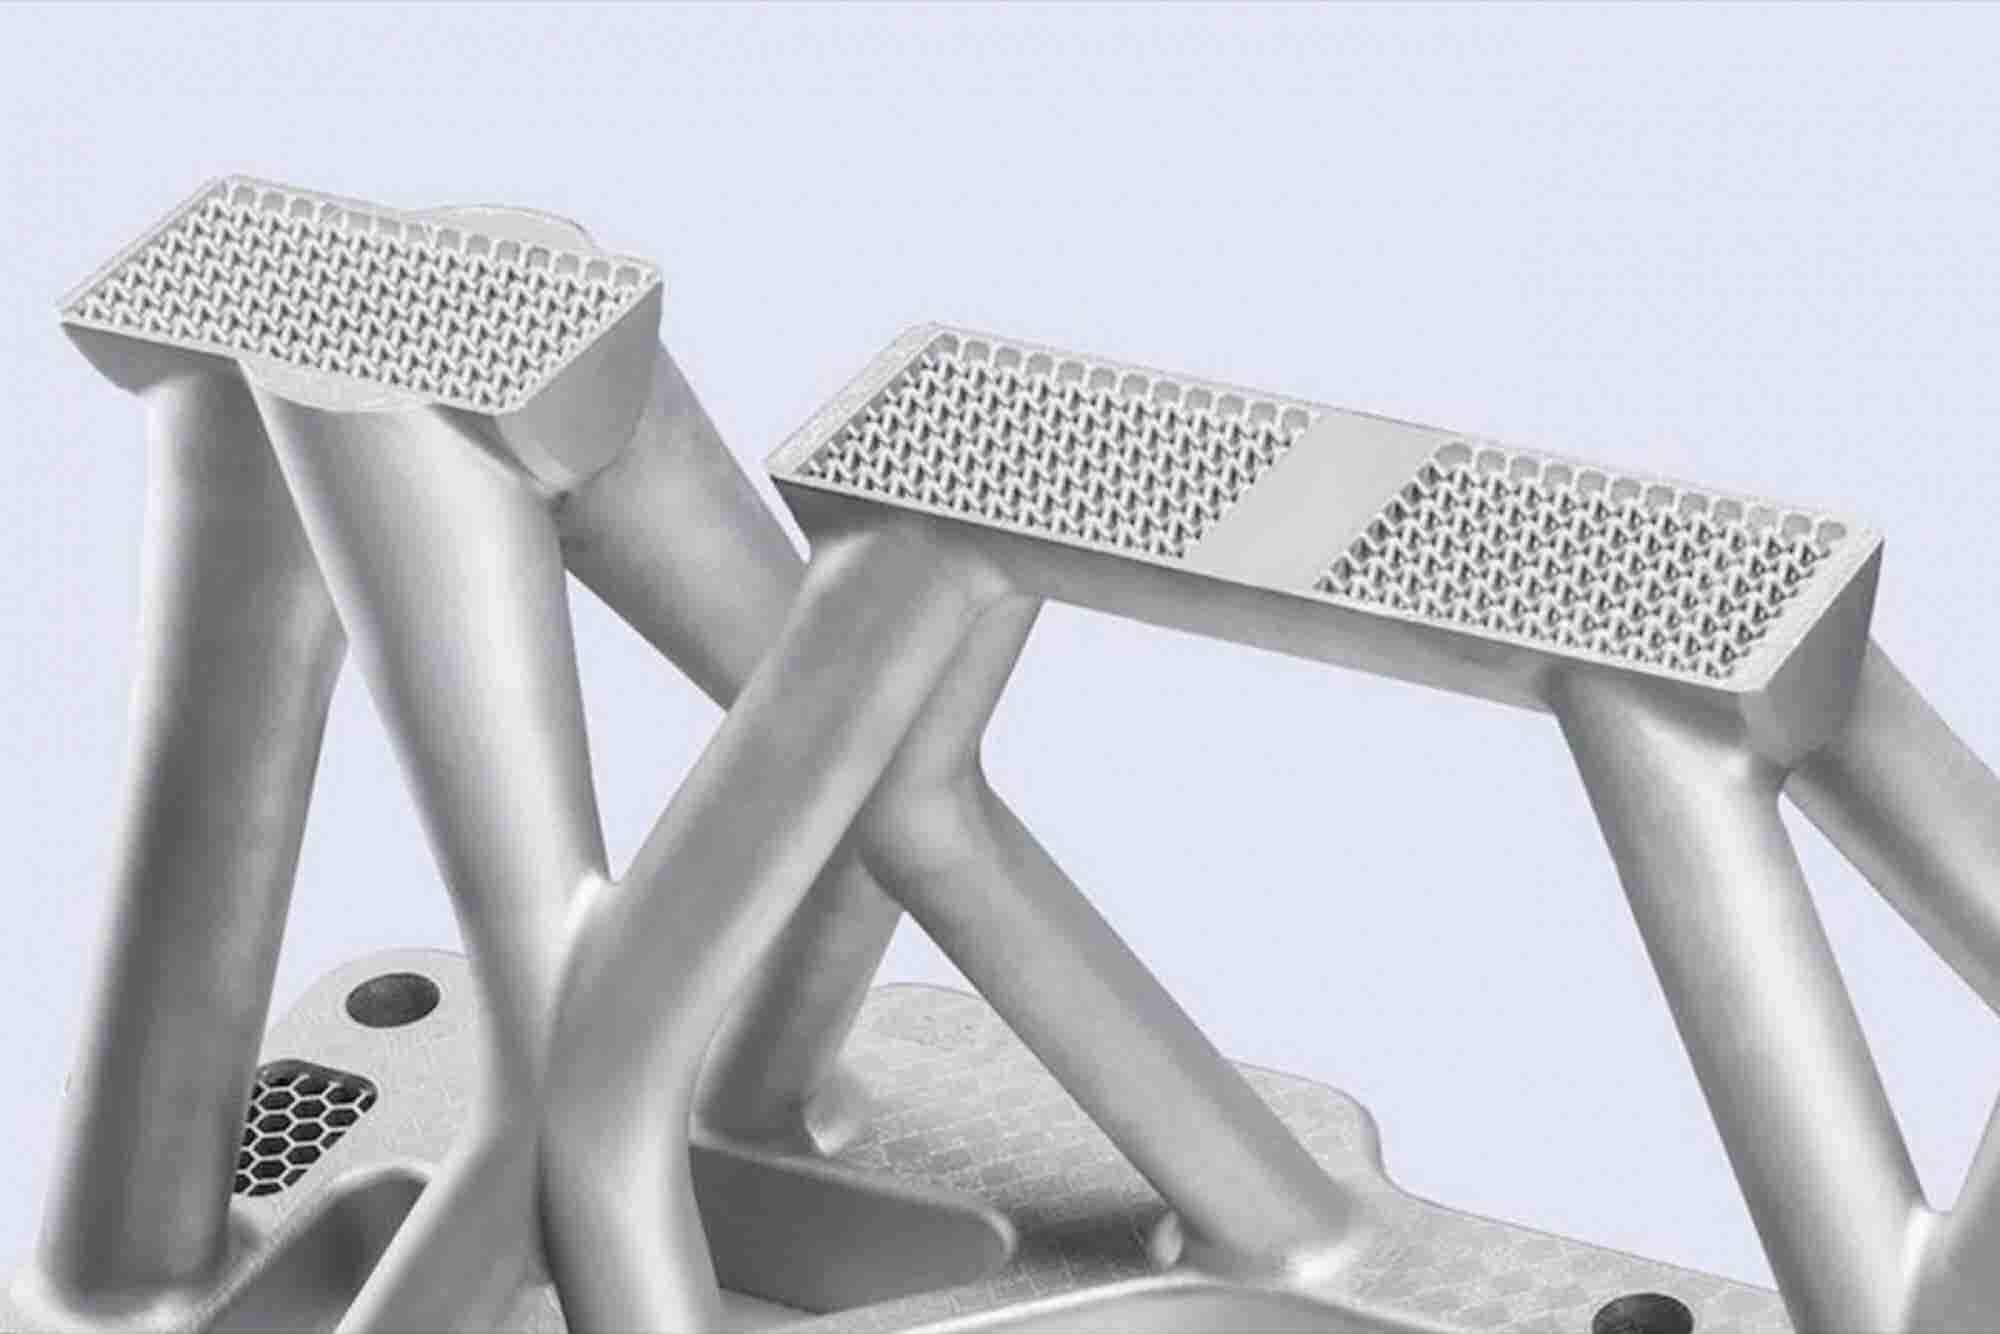 GE Plans World's Largest Laser-Powered 3D Printer